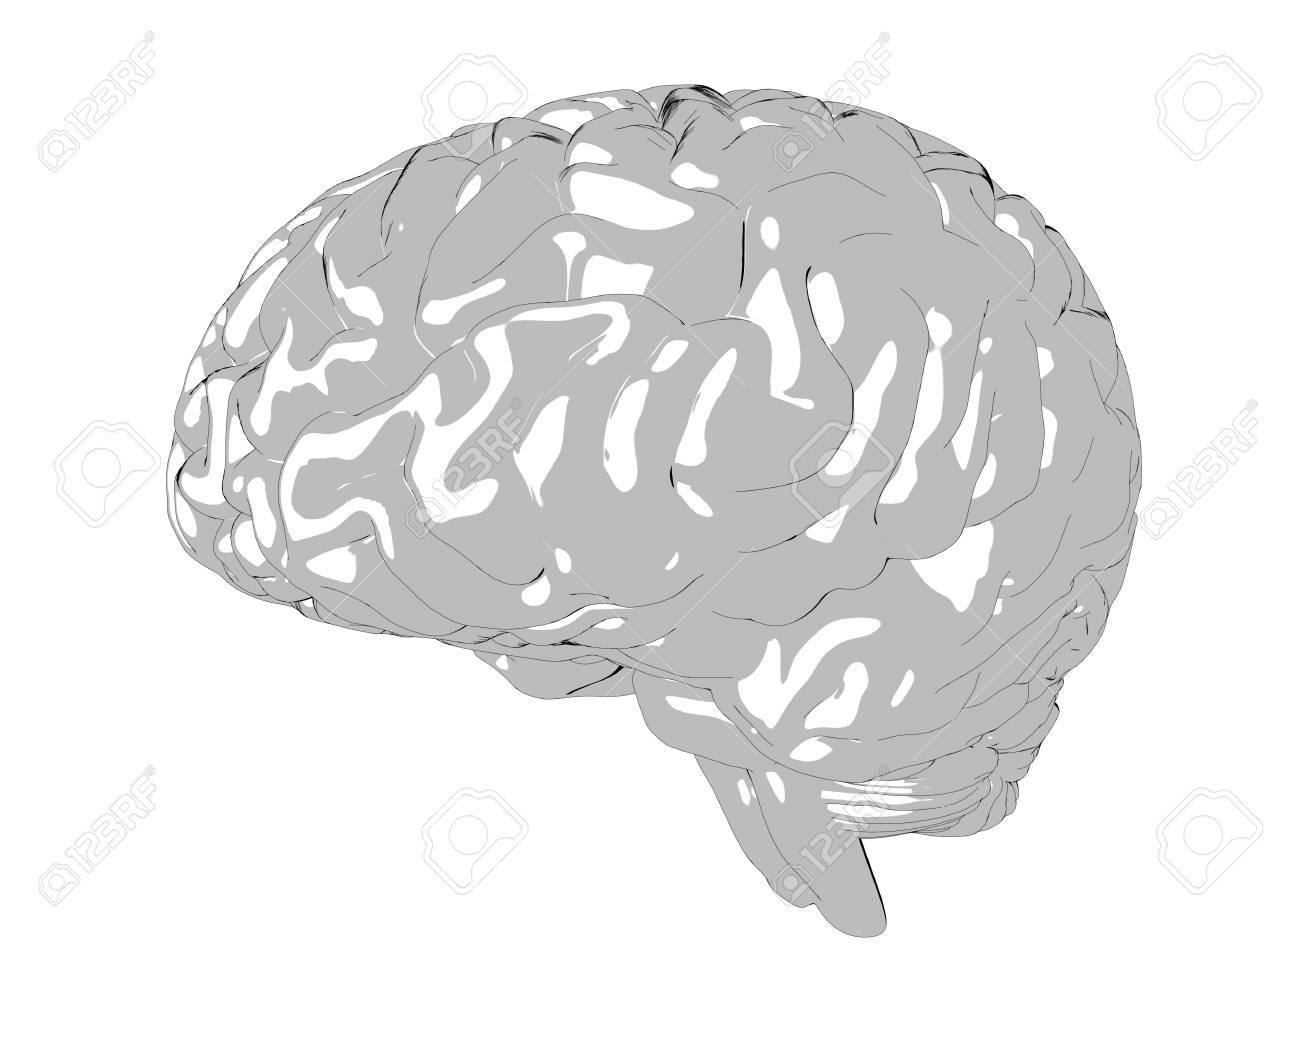 Human brain 3D render Stock Photo - 75860174